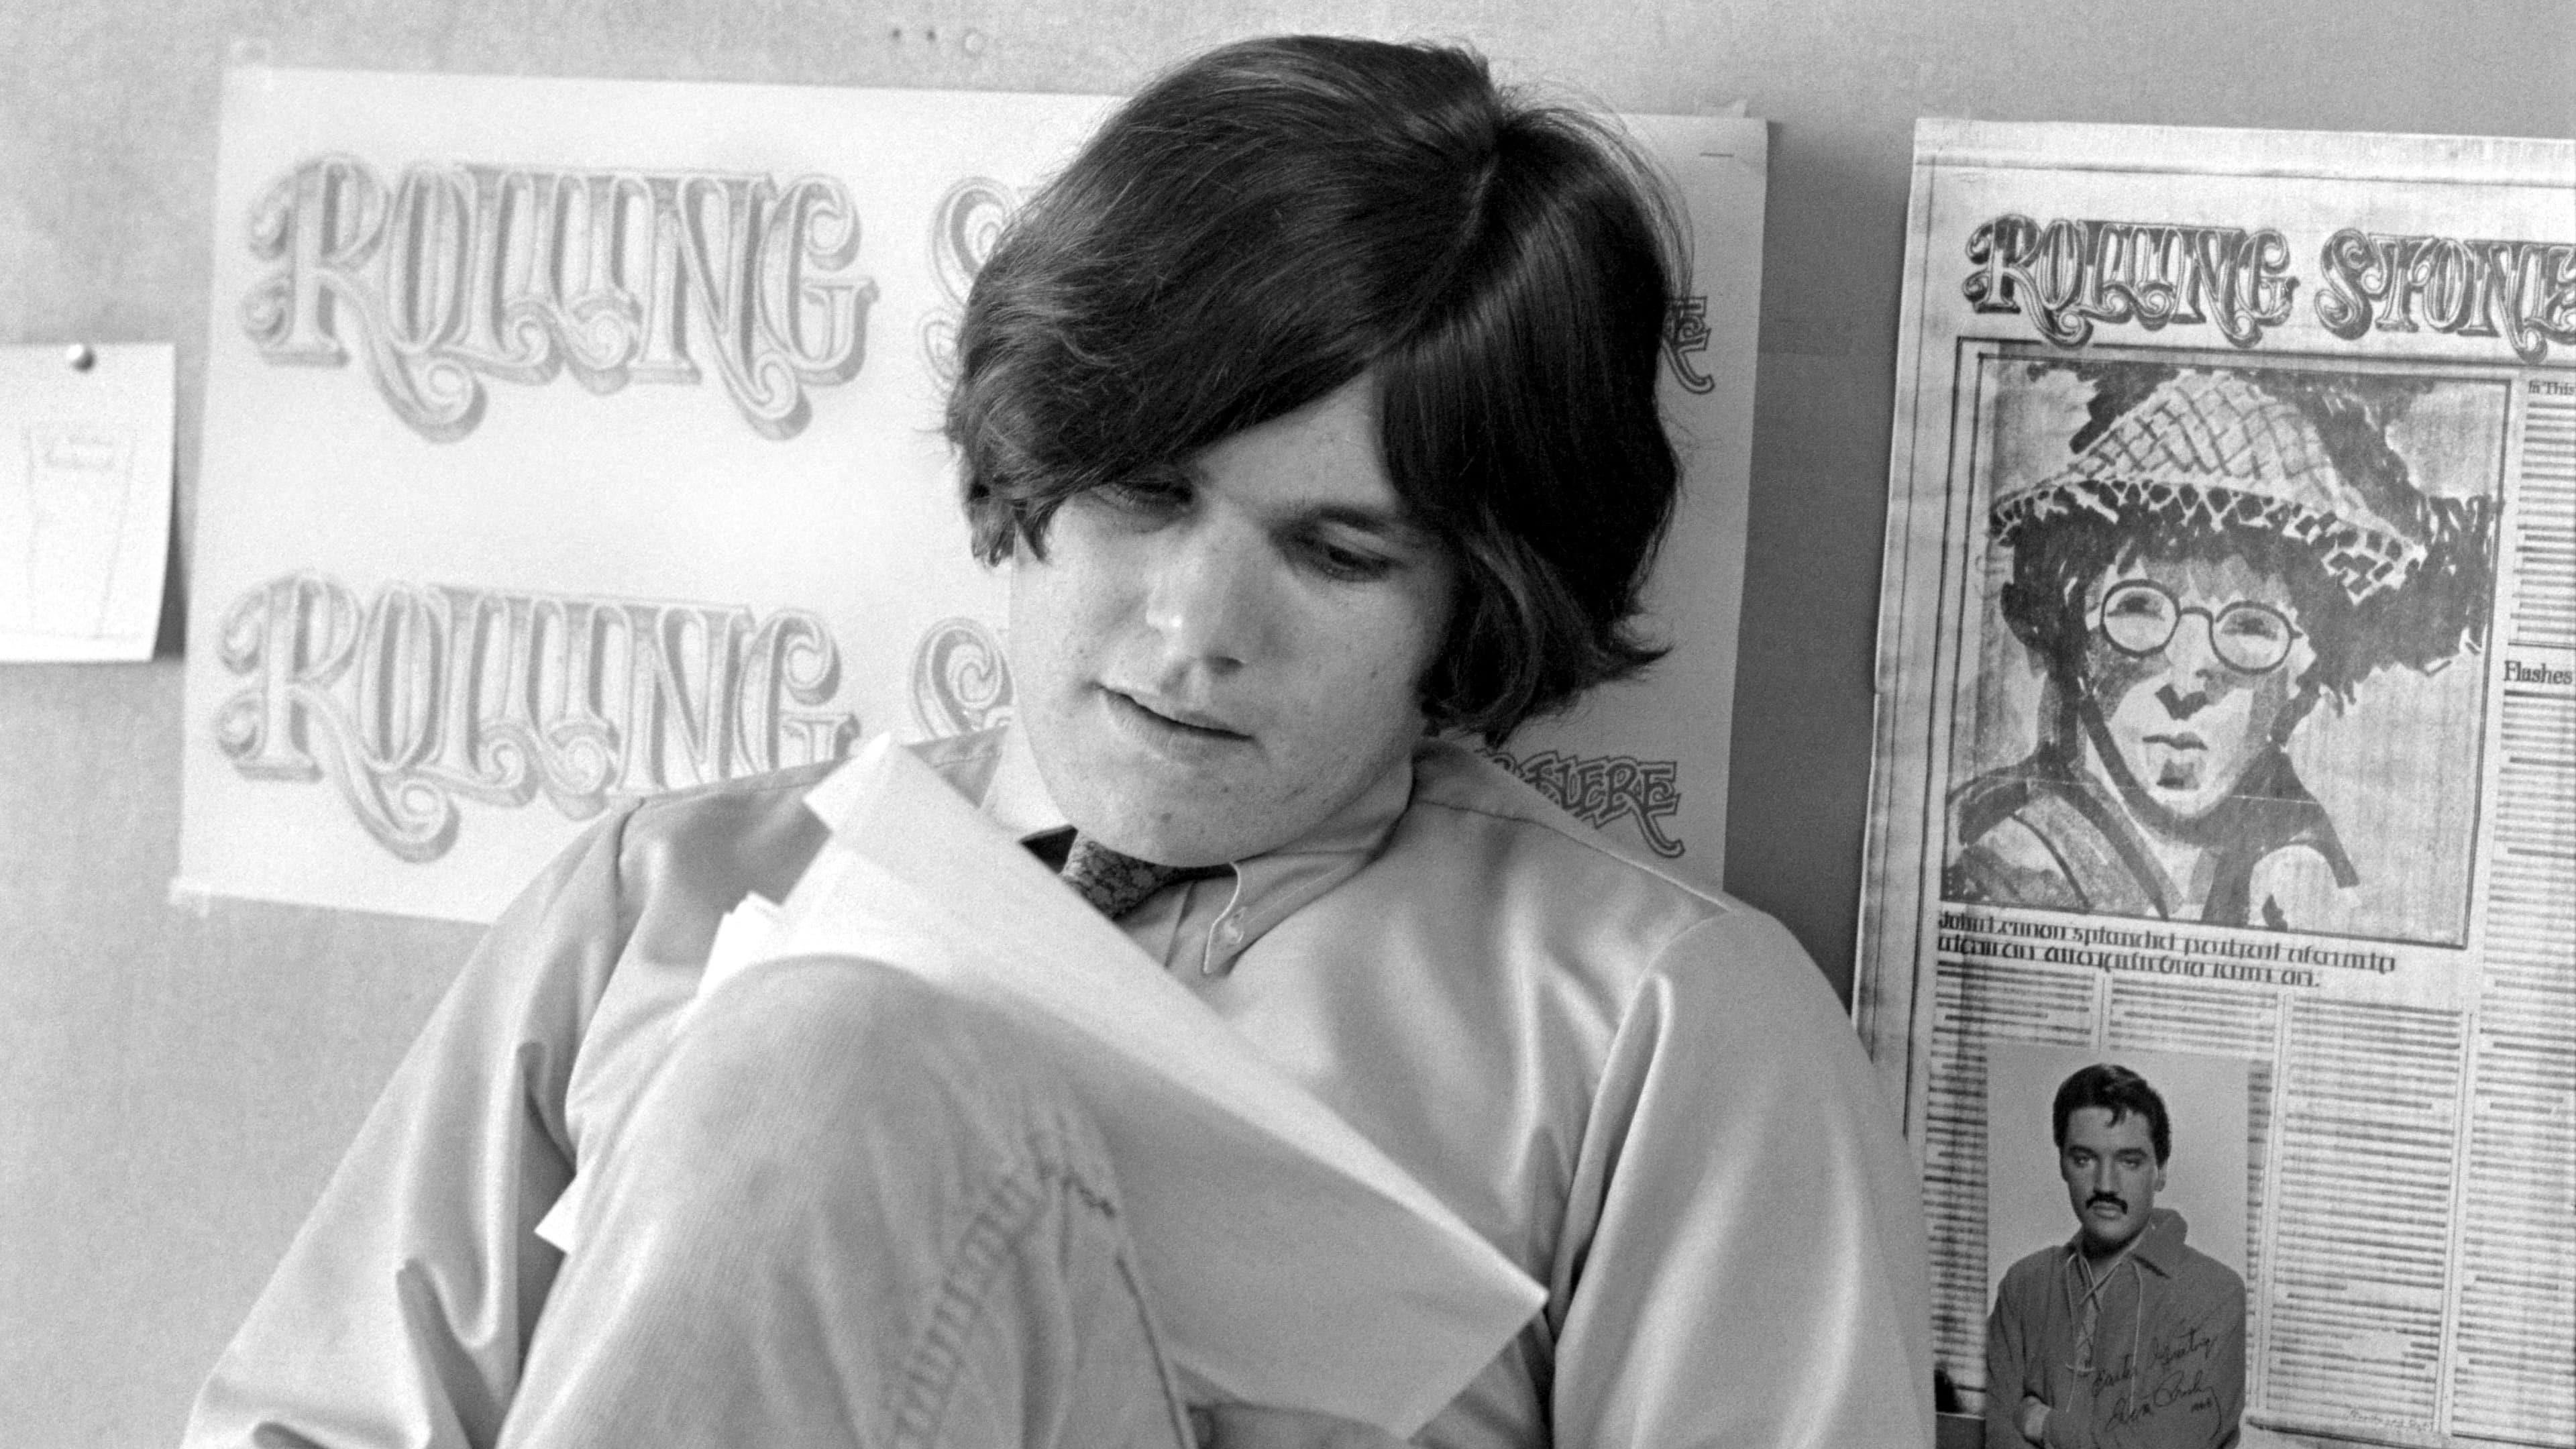 Regarder Rolling Stone: Stories From the Edge en streaming gratuit